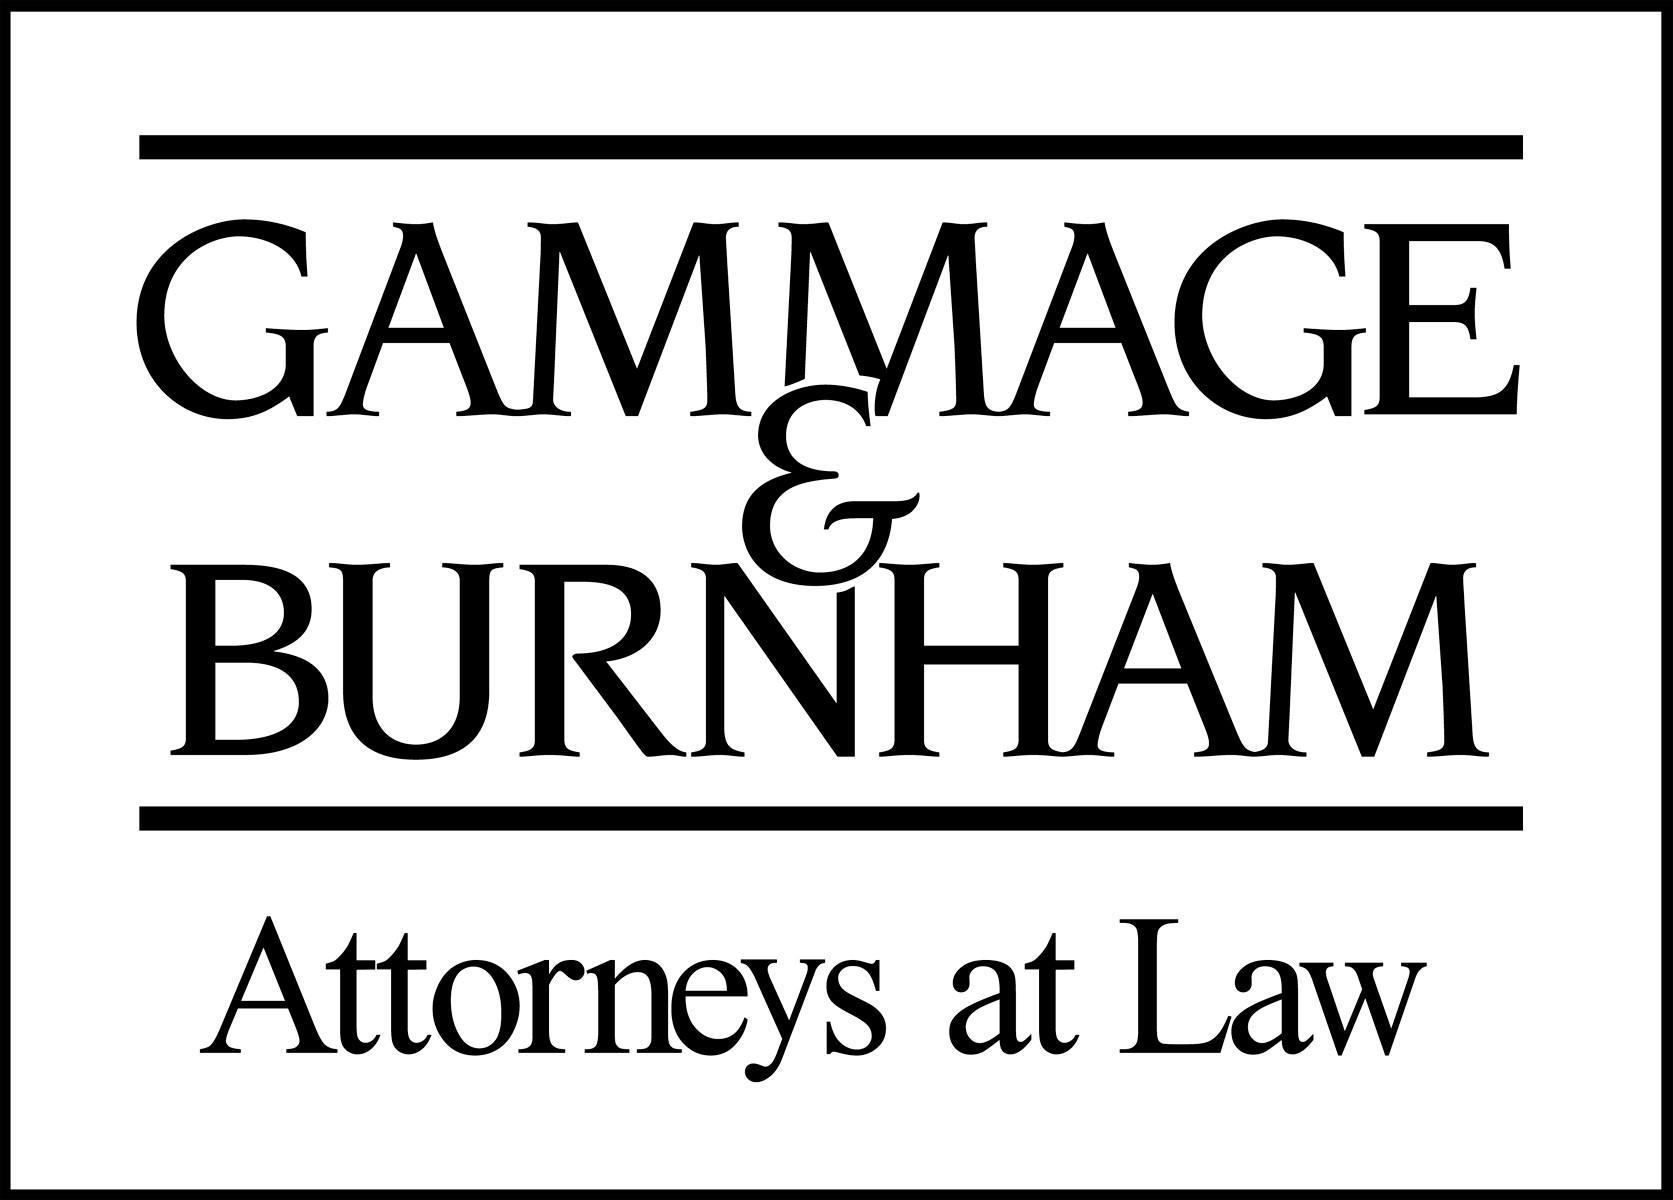 Gammage and Burnham Logo